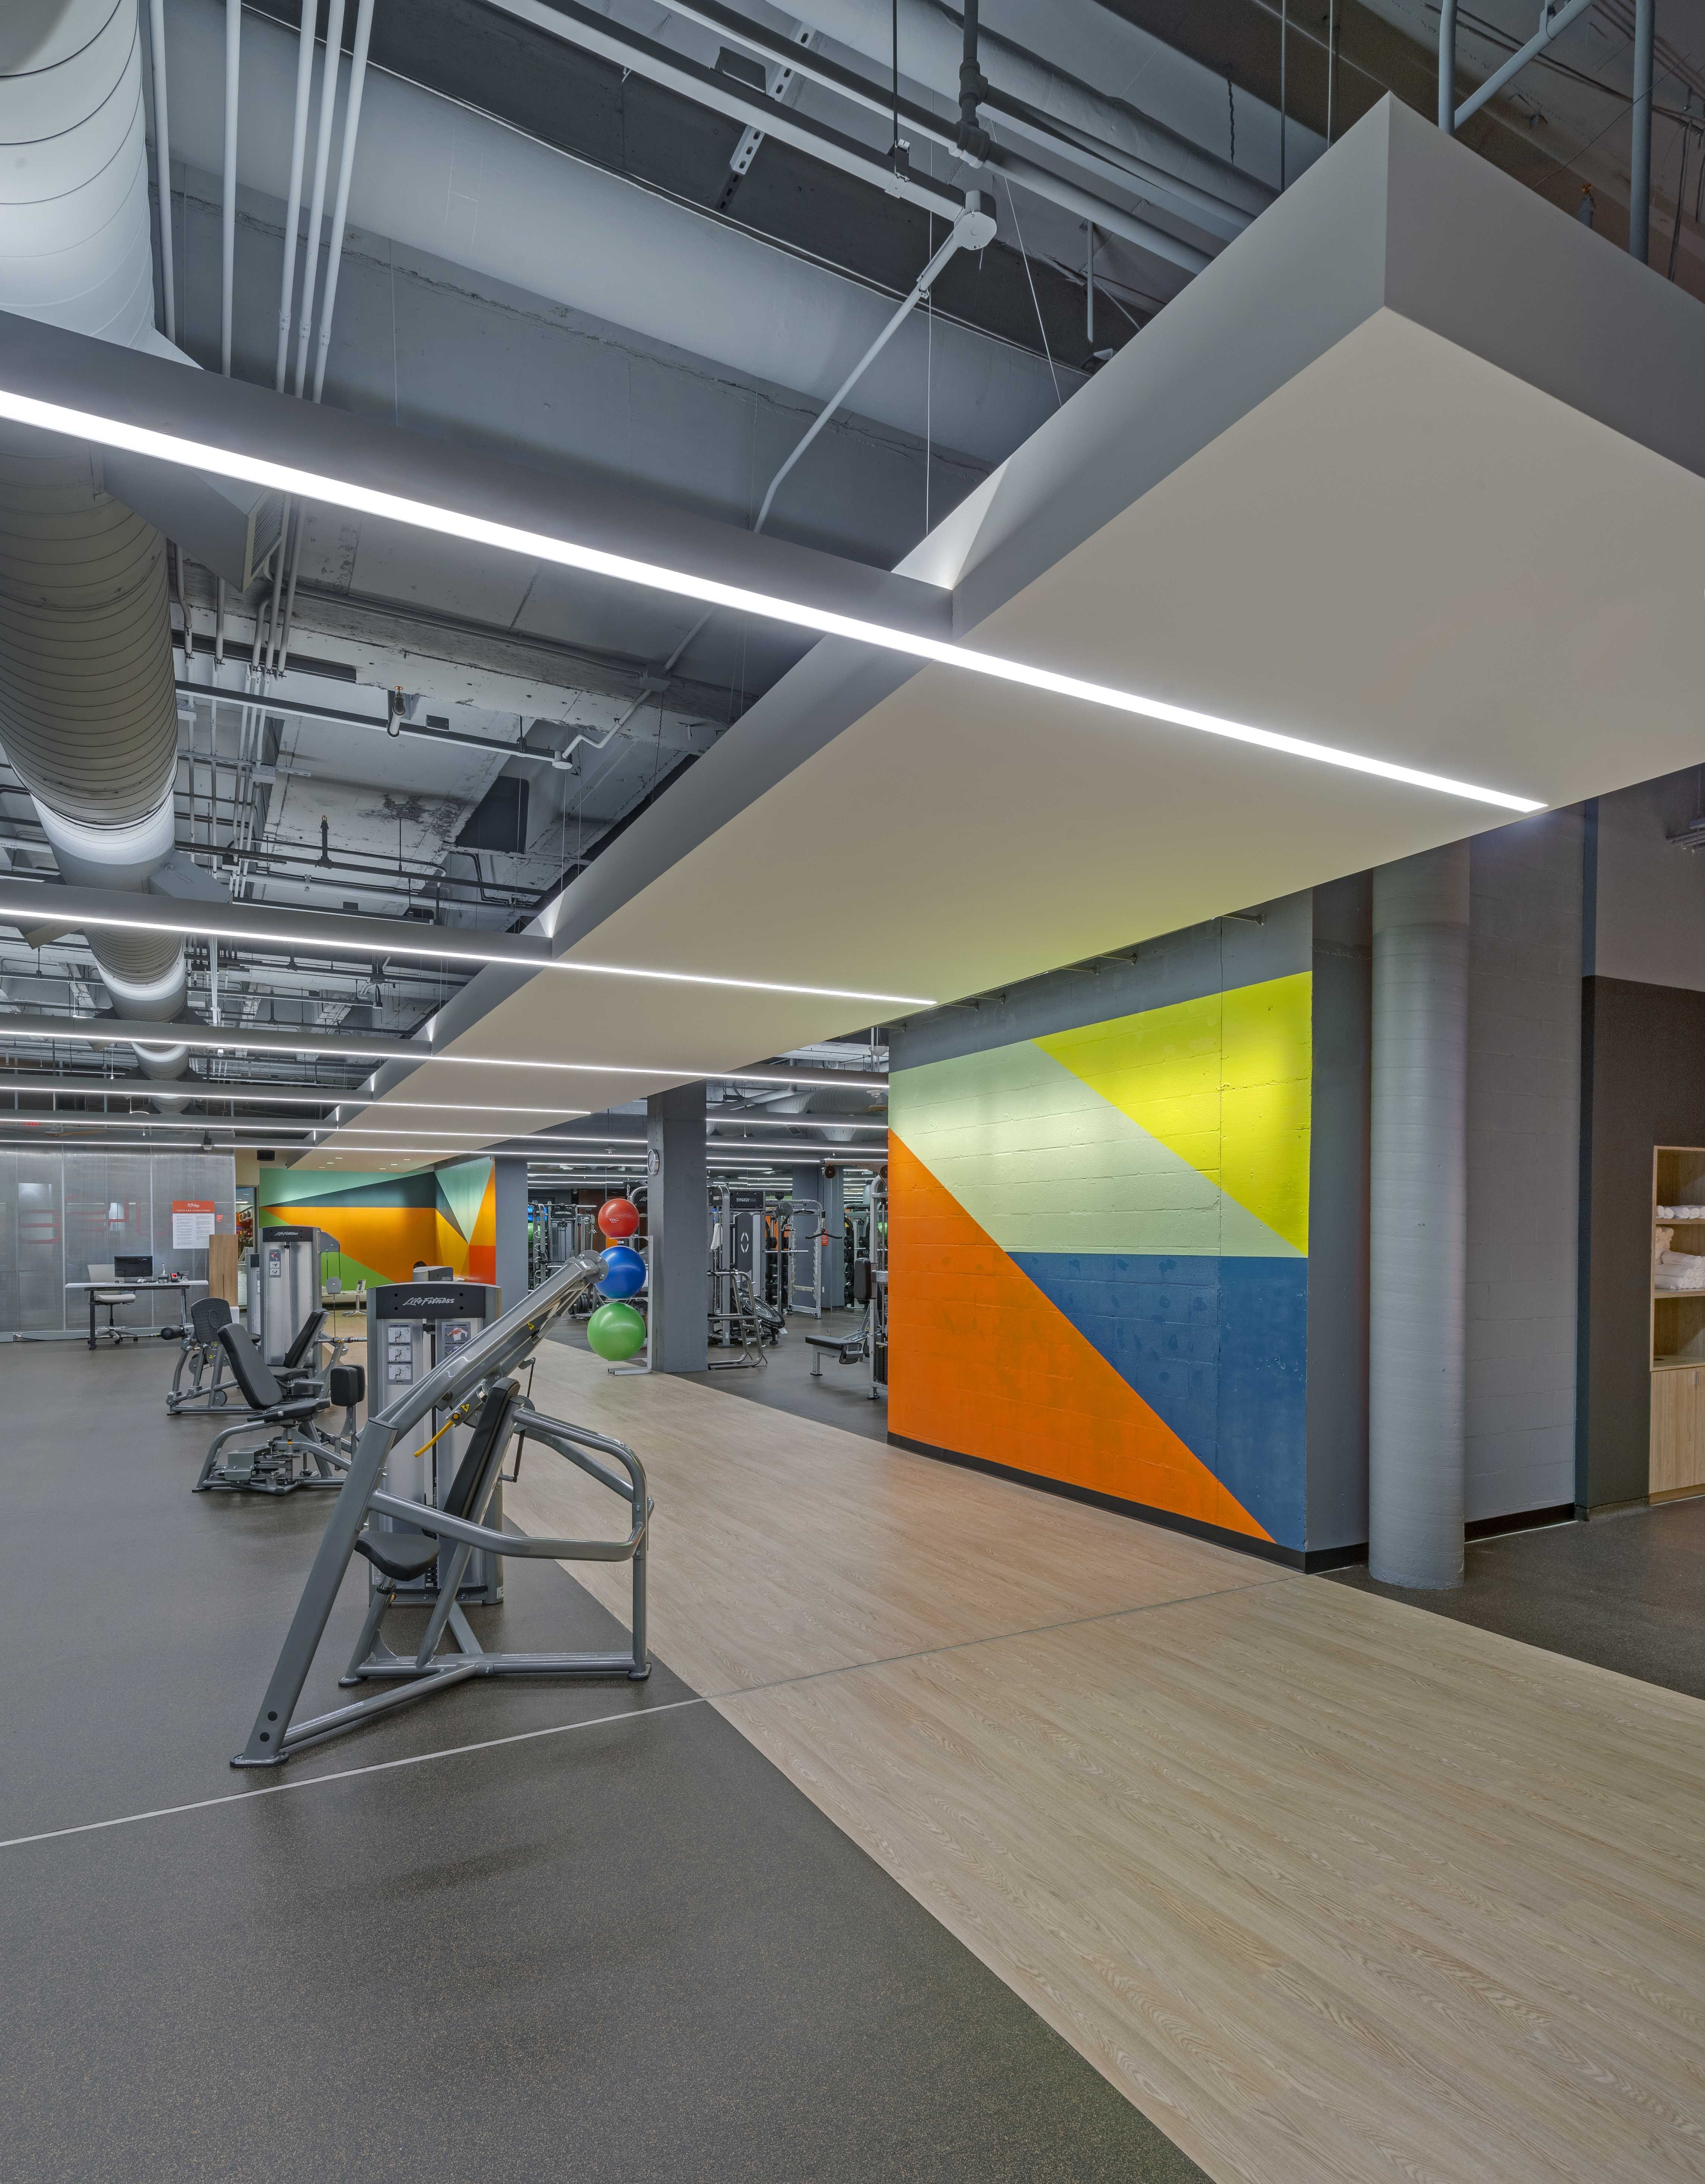 Pulse Fitness Houston Texas Fitness Pulse Pulsefitness Workout Athlete Athletic Greenway Greenwayplaza Interio Corporate Interiors Interior Design